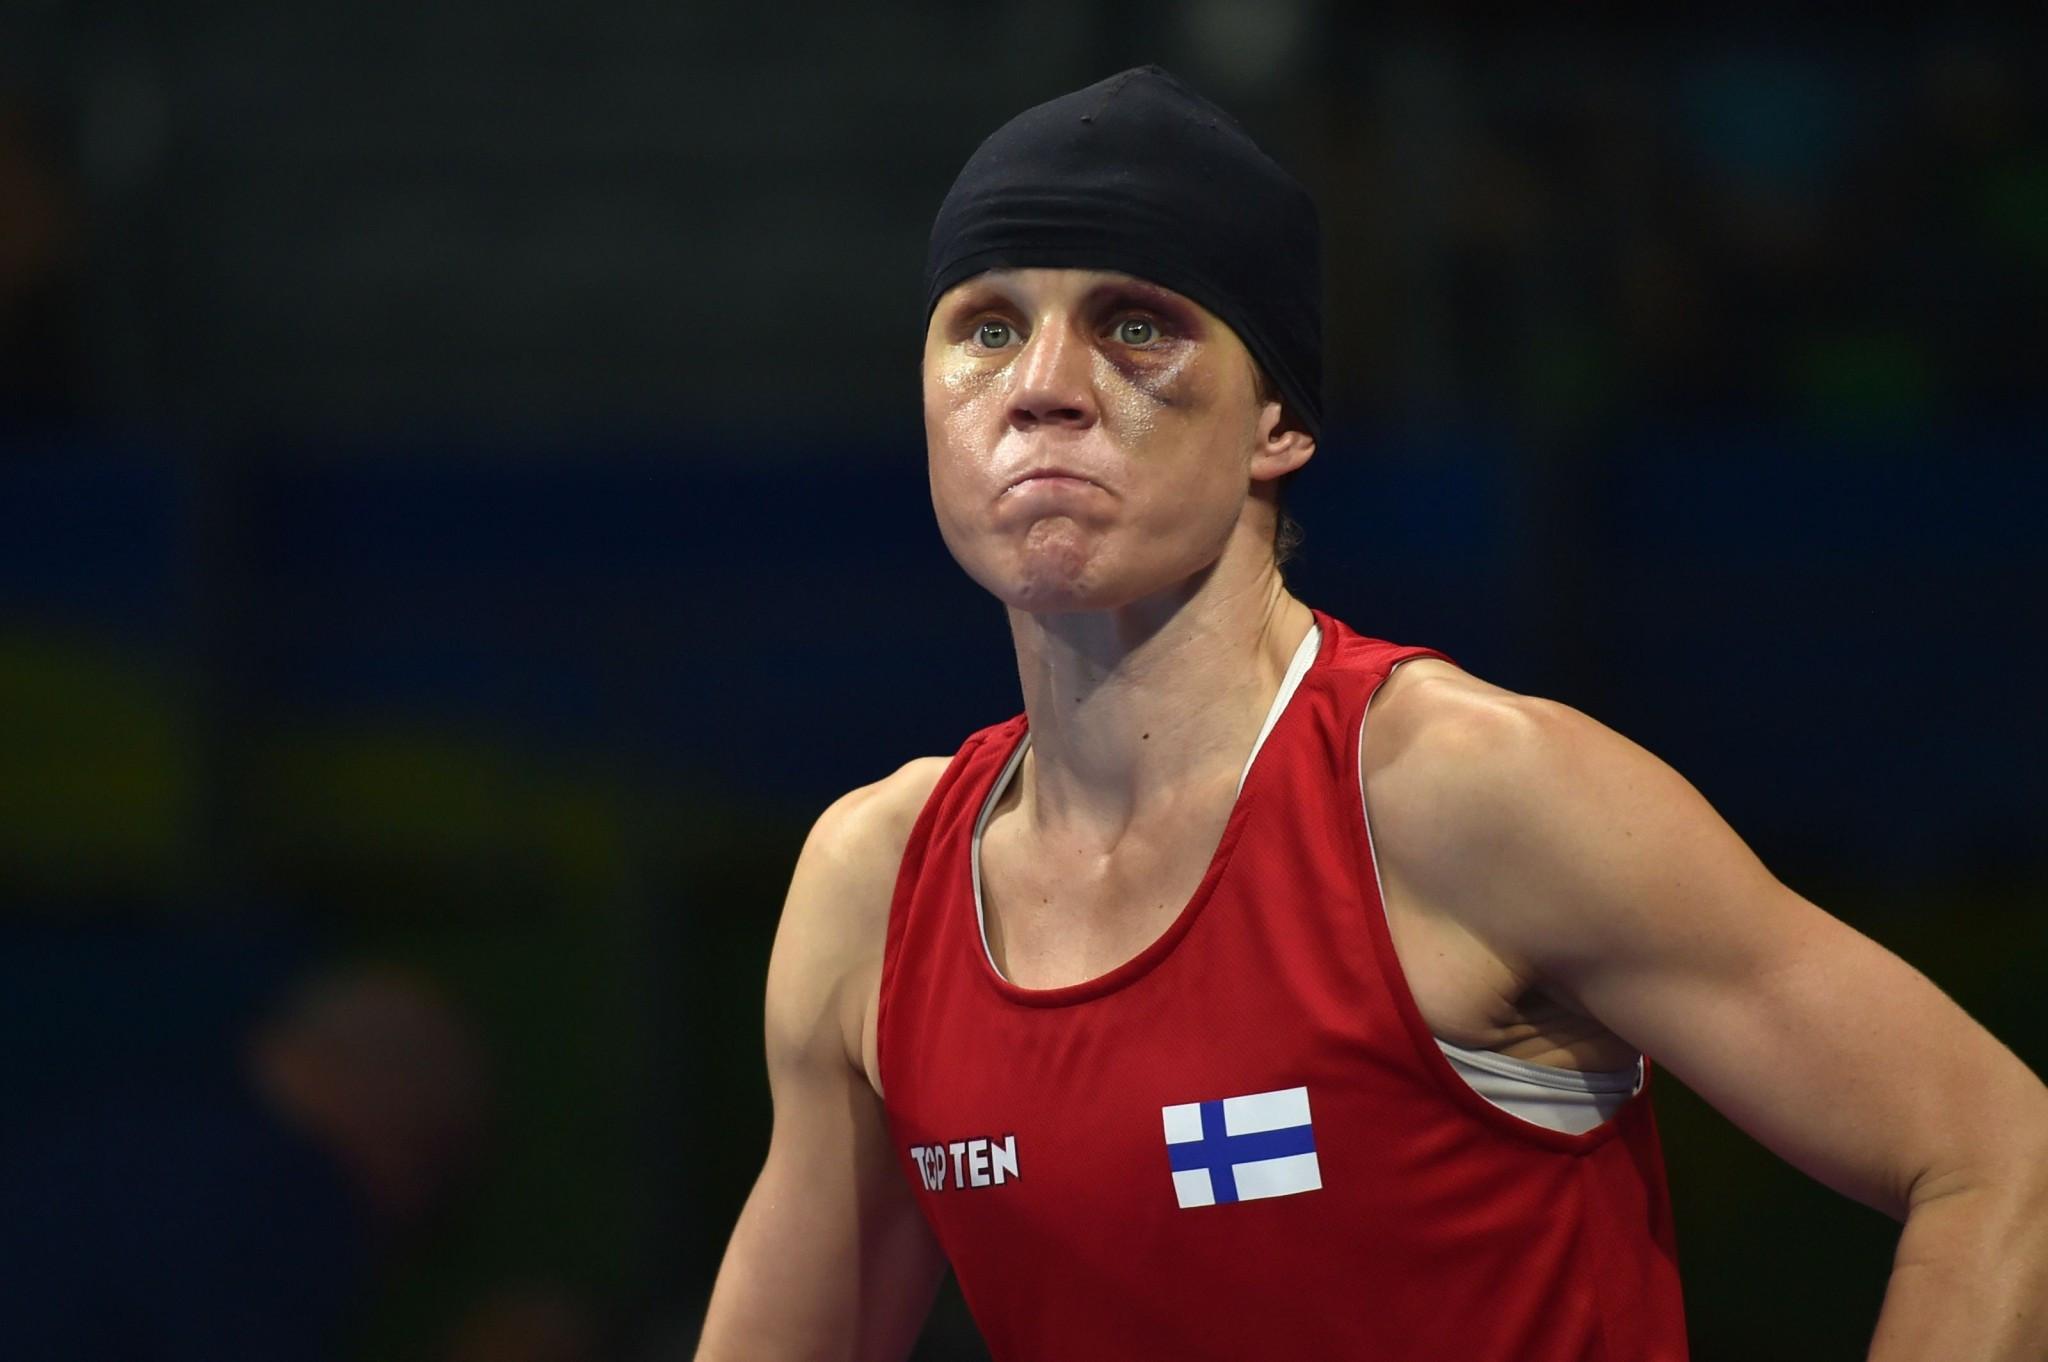 Rio 2016 bronze medallist reaches final at Women's European Boxing Championships